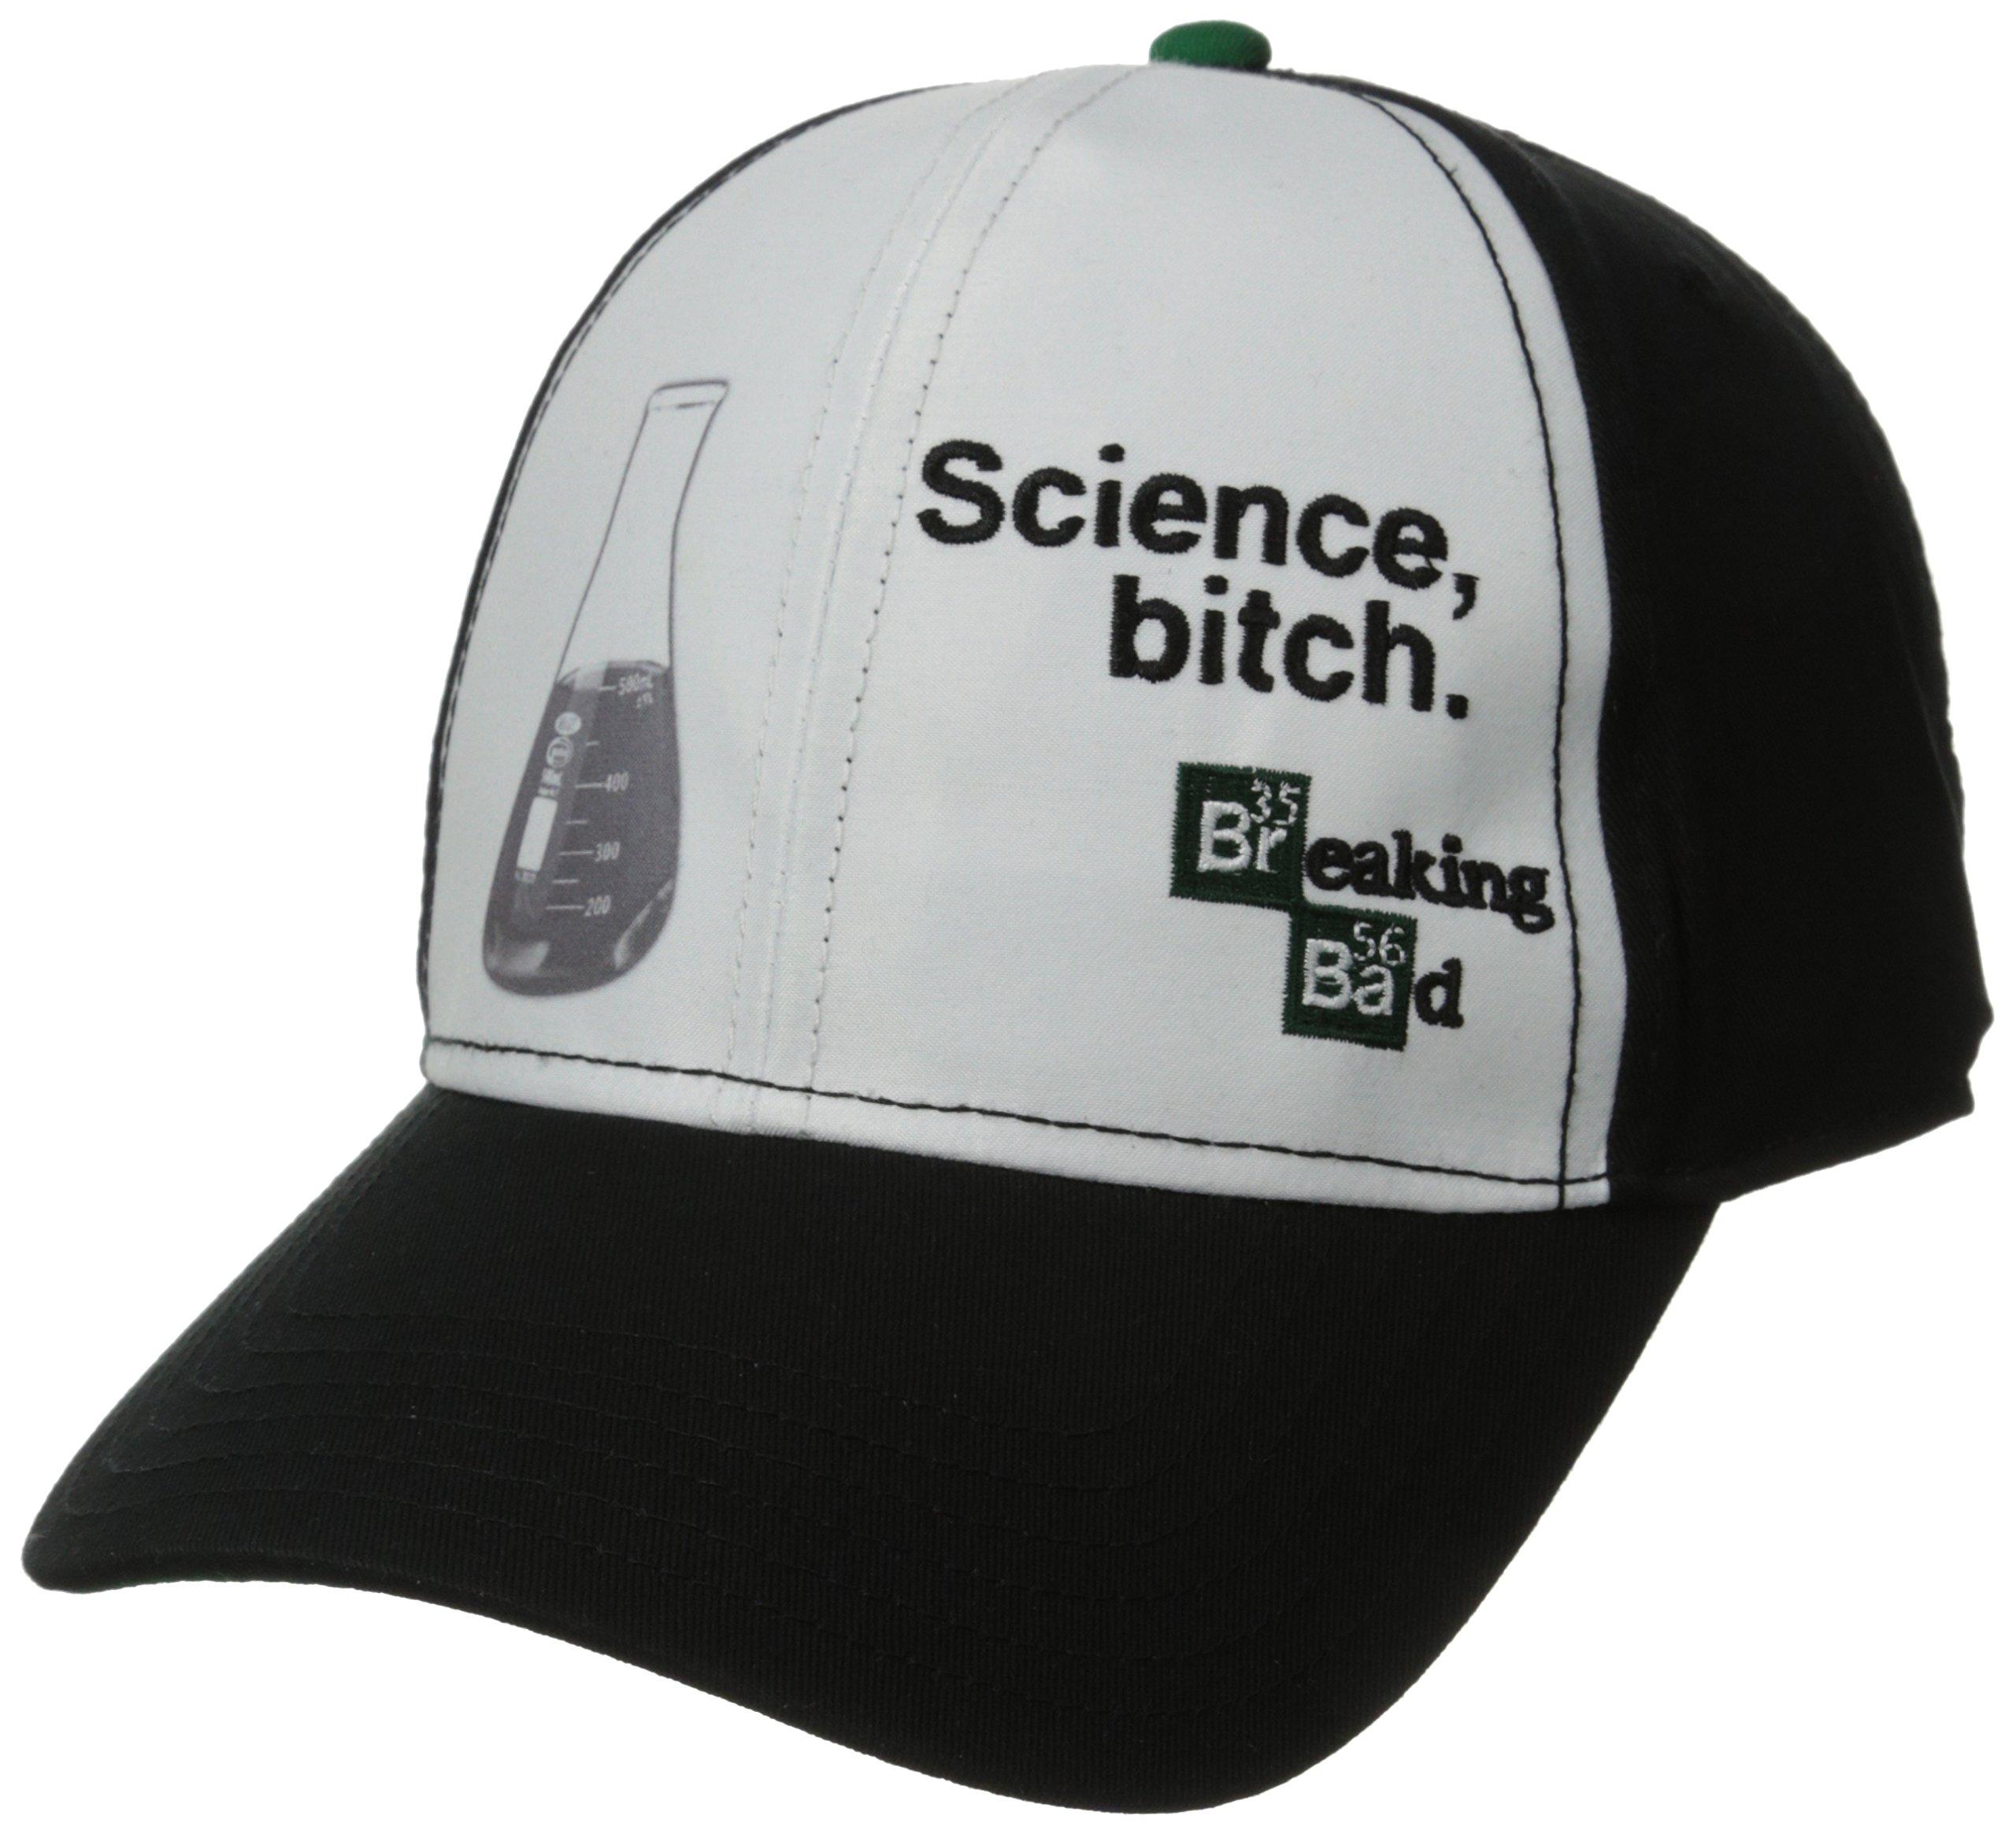 Breaking Bad Men's Science Bitch Baseball Cap